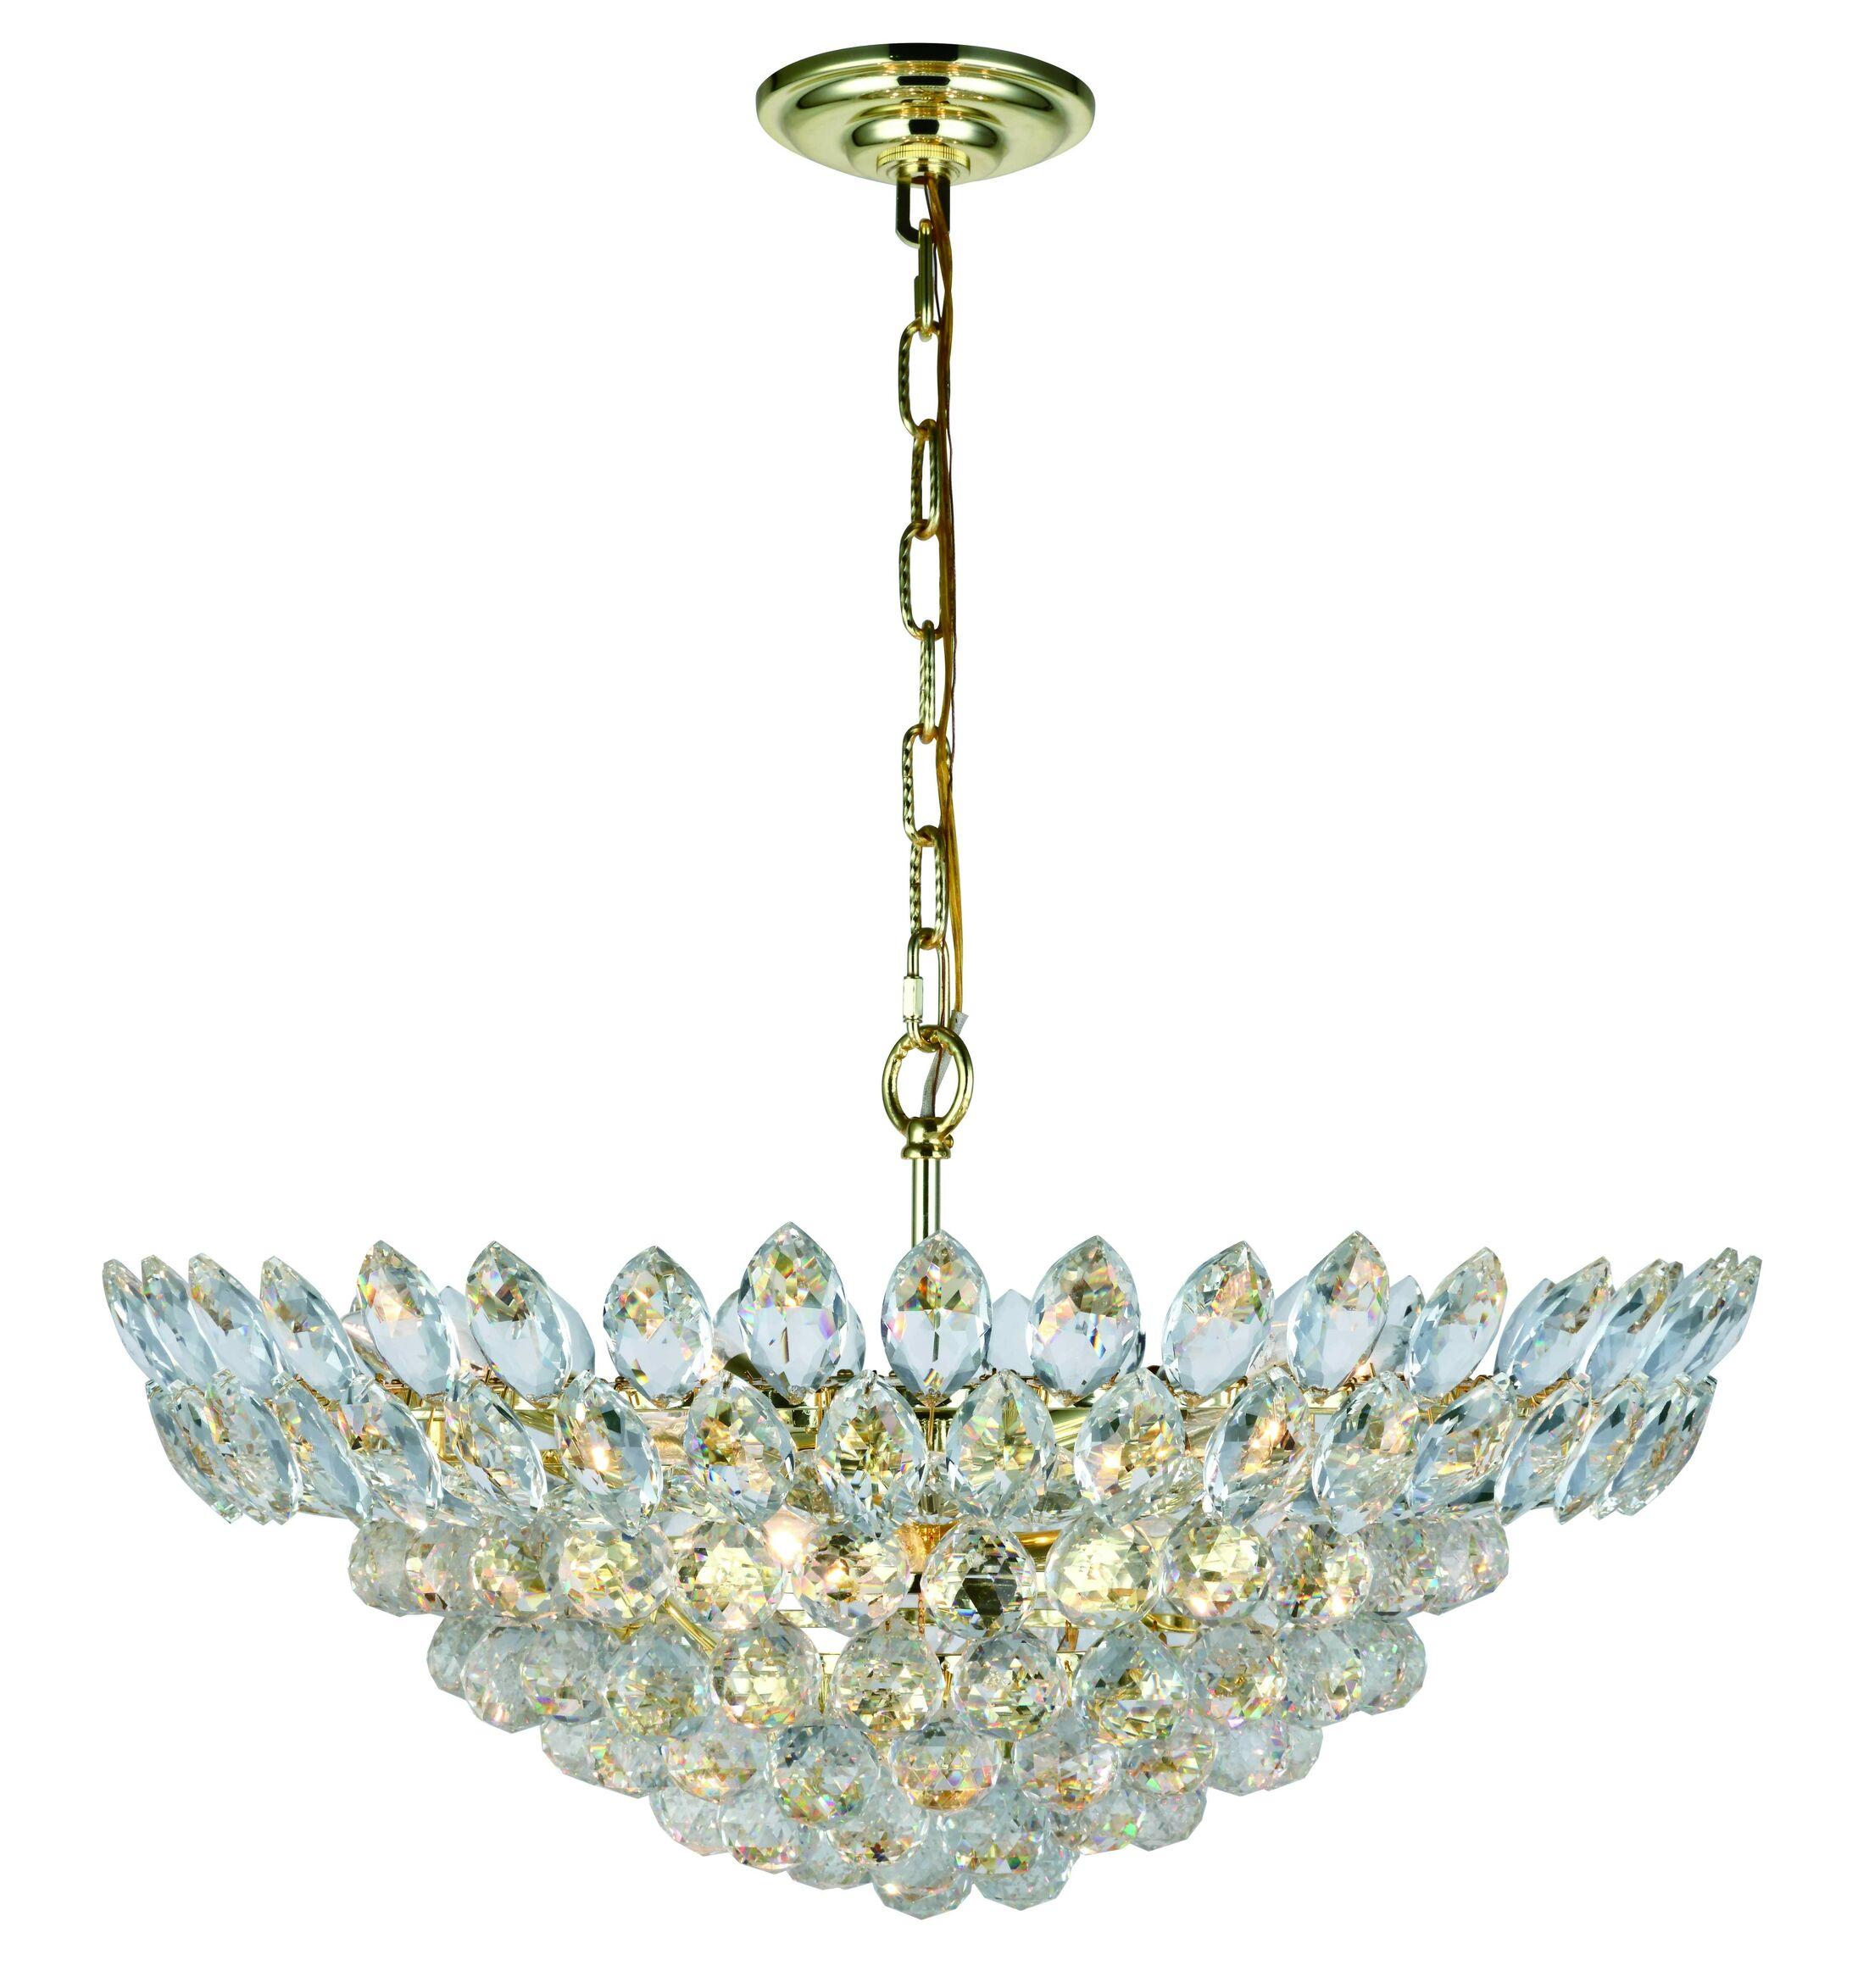 Glendora 11-Light LED Crystal Pendant Finish: Gold